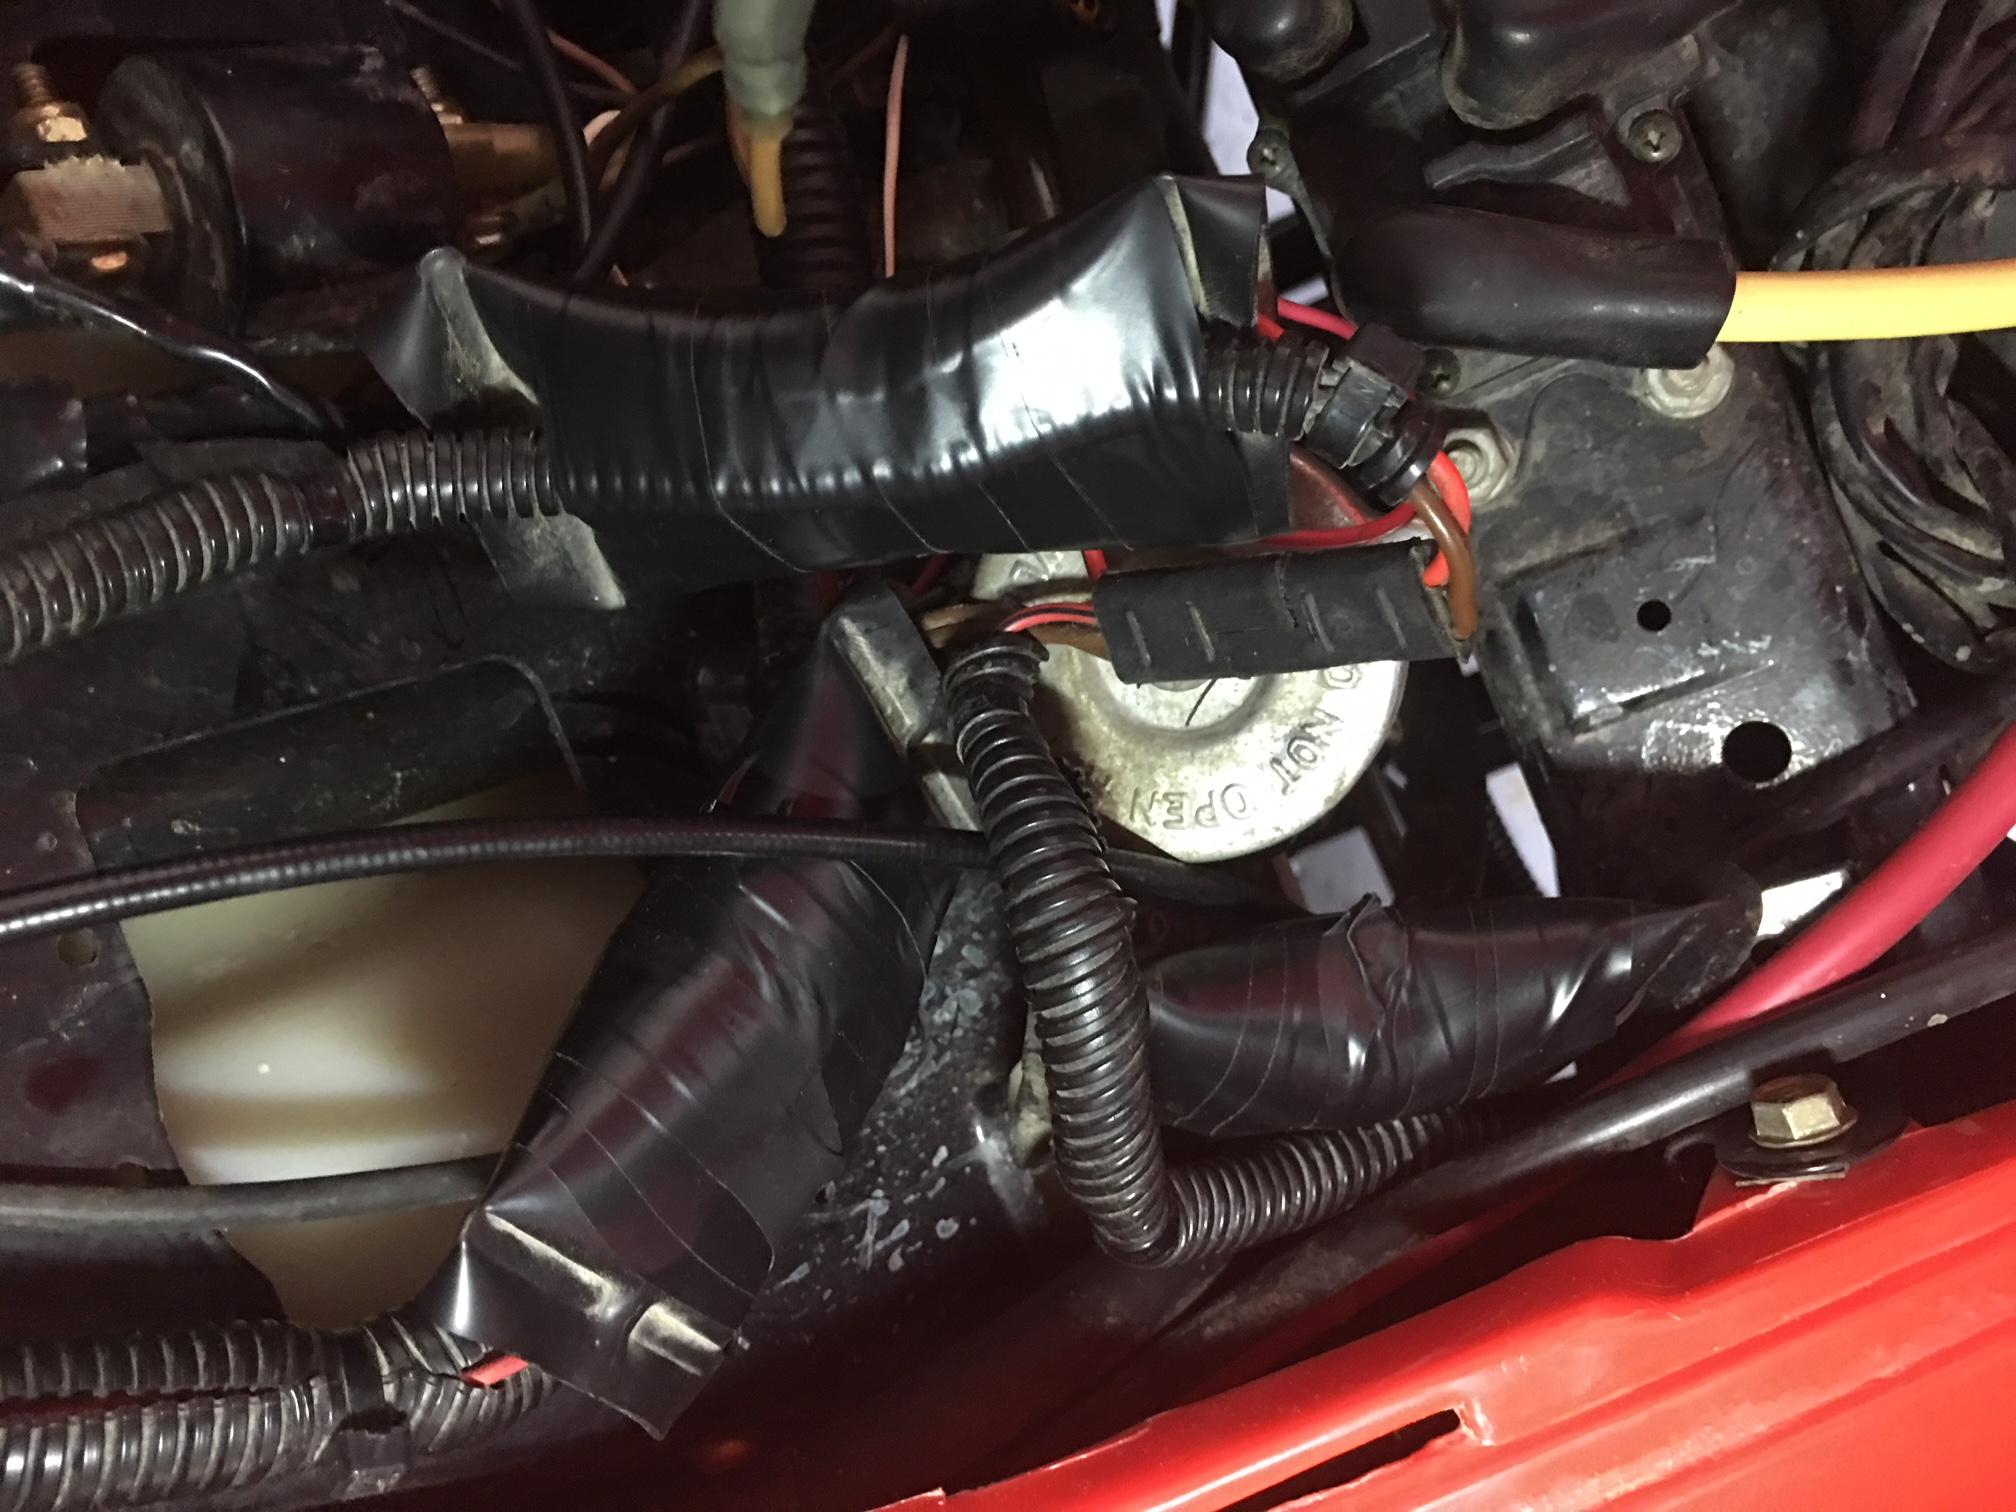 2002 Polaris Sportsman wiring help needed. - Polaris ATV Forum